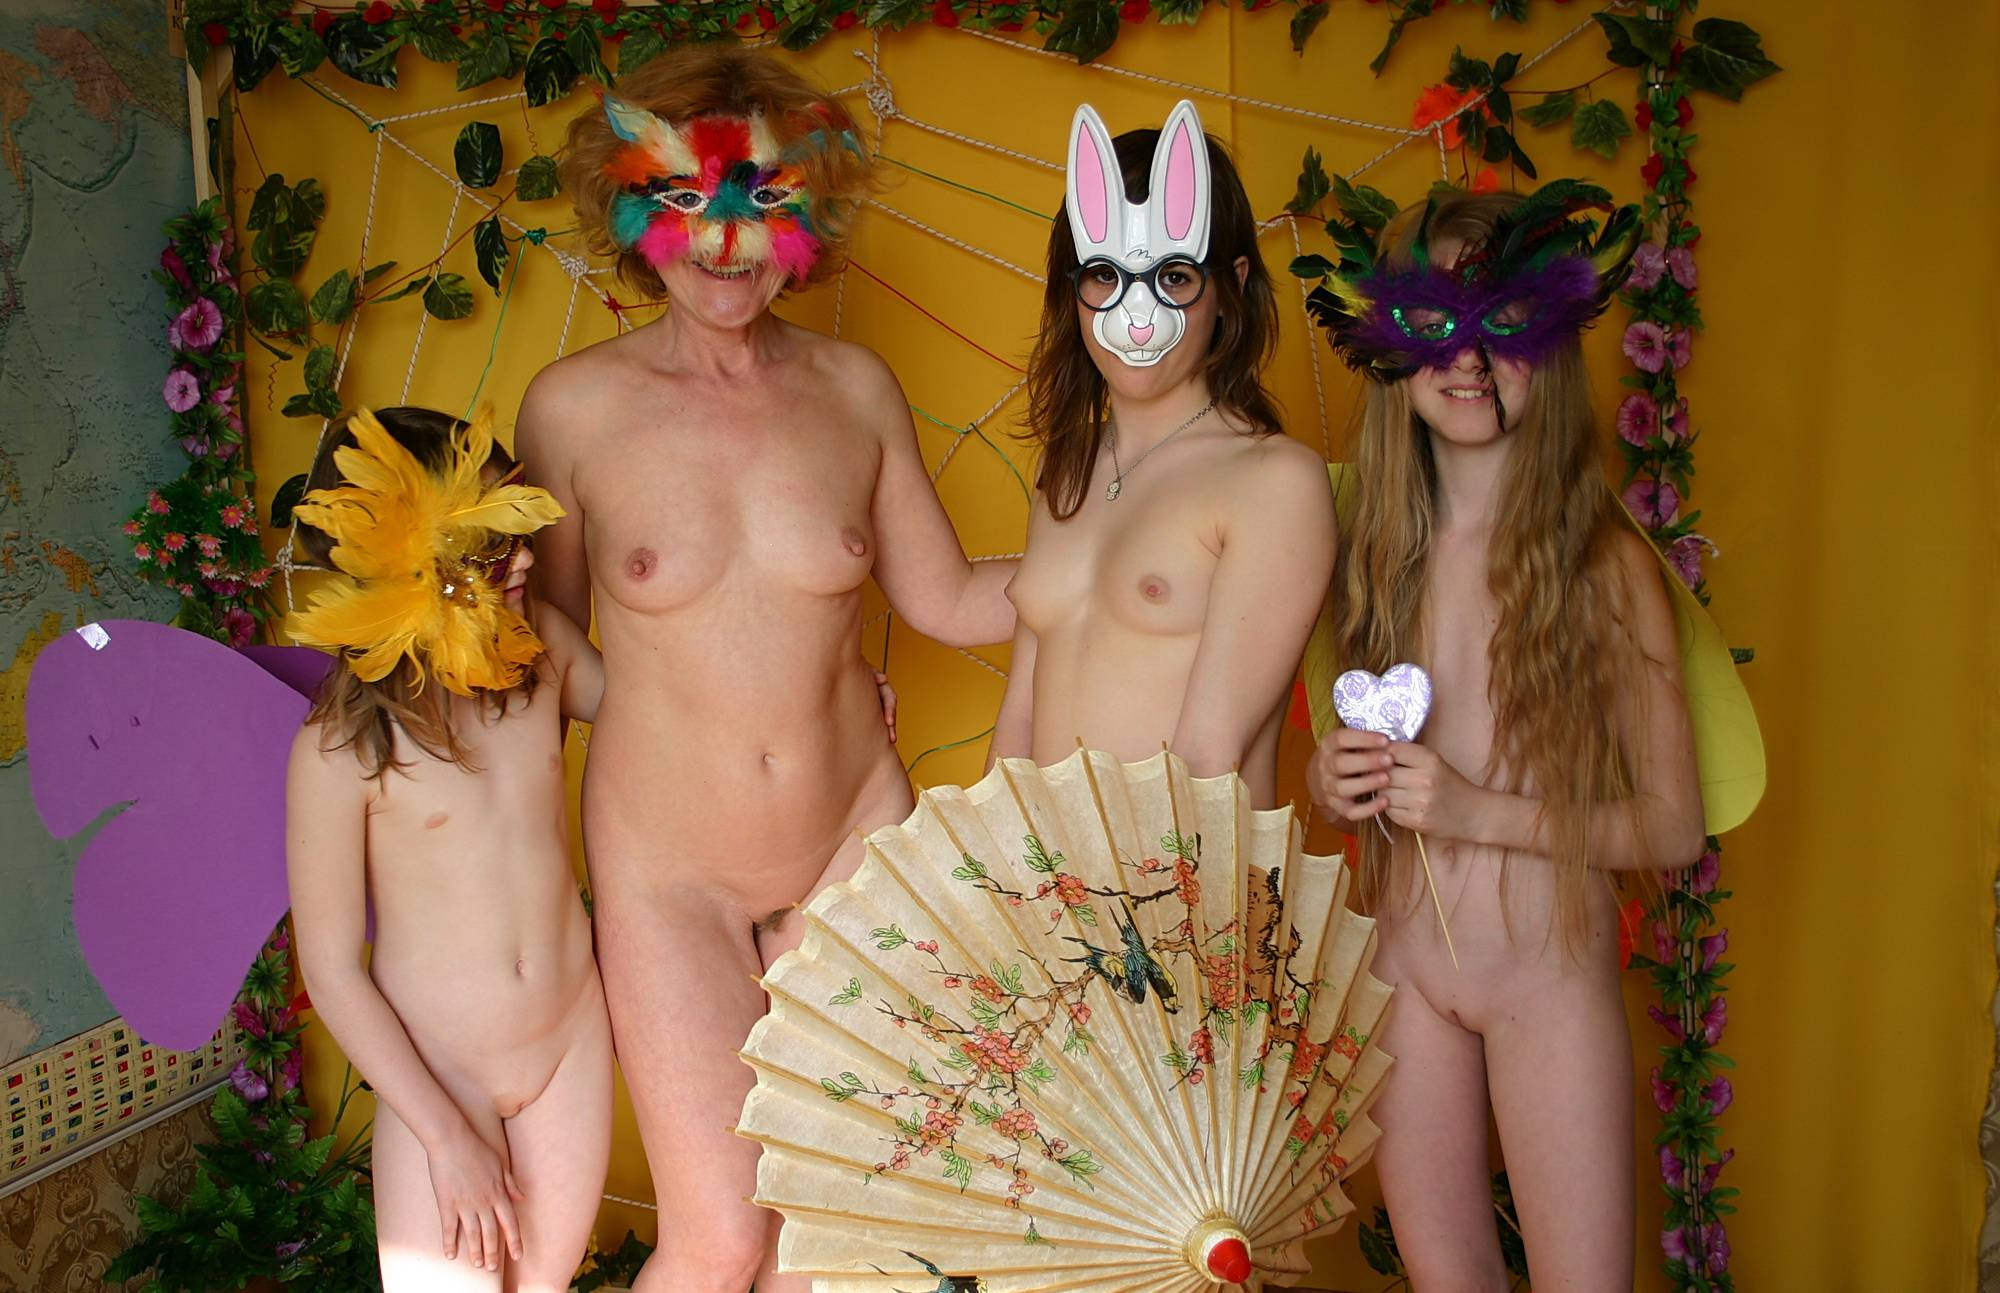 The Yellow Umbrella Fun - 1